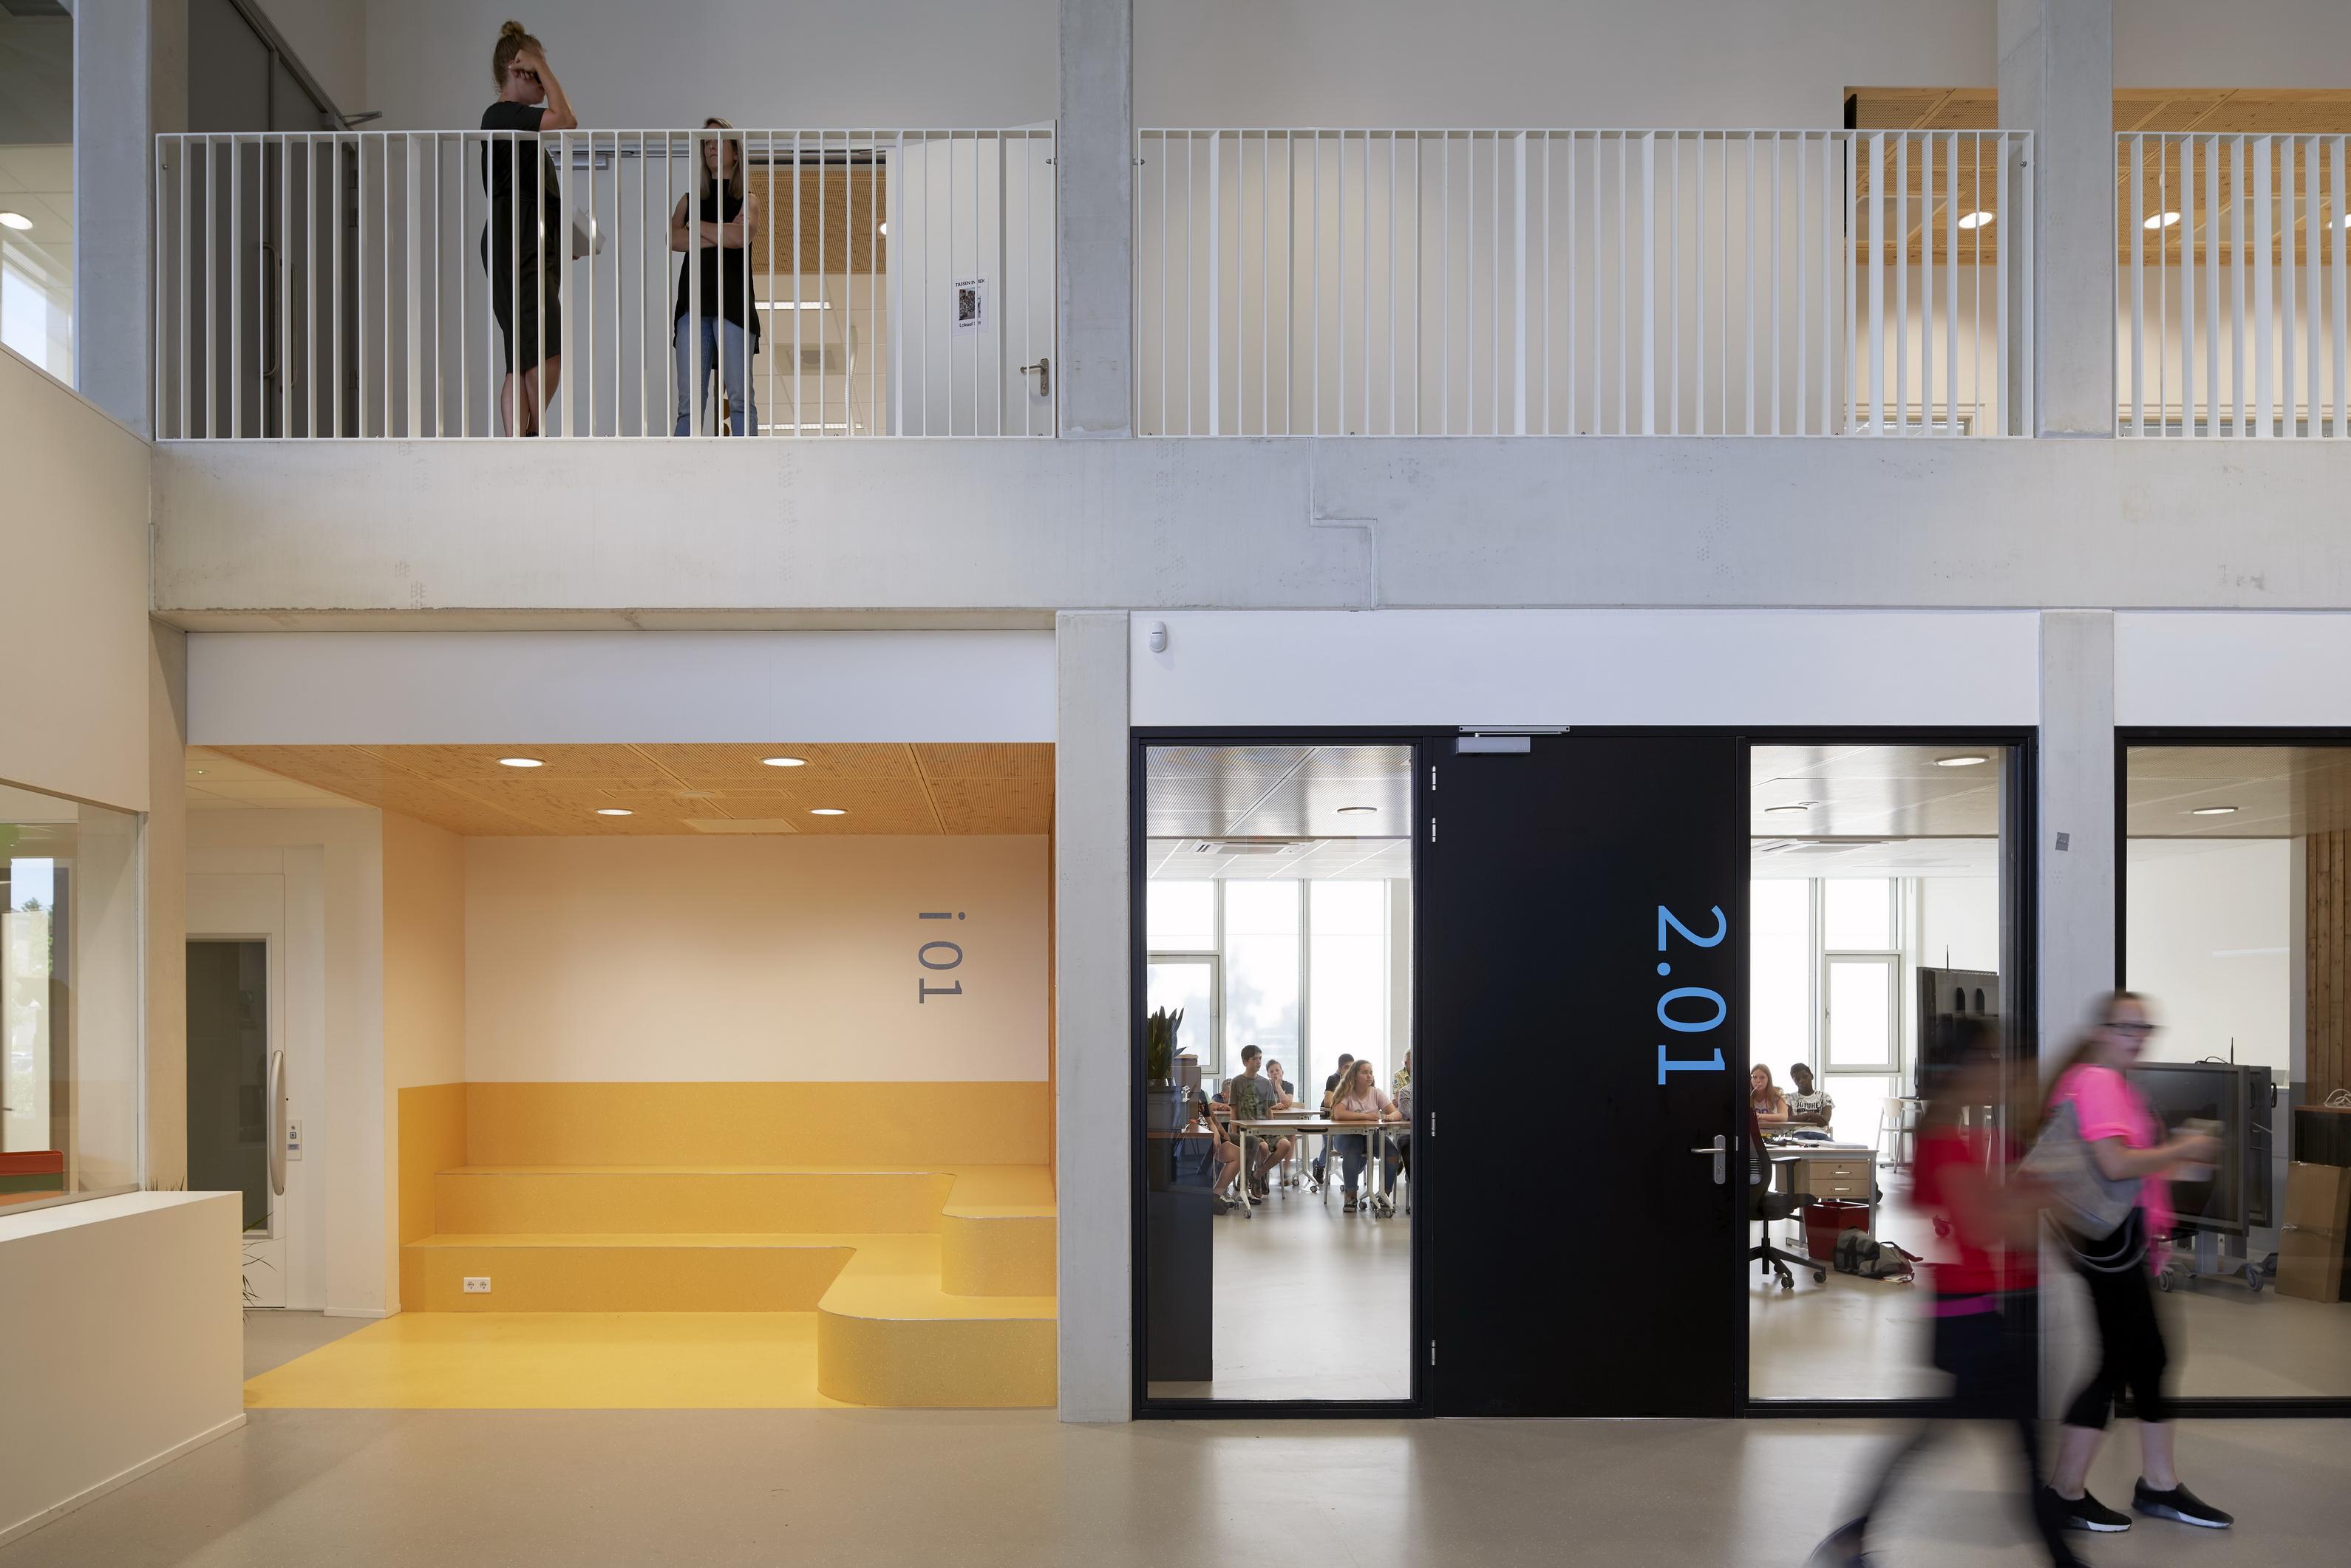 <p>Nuenenscollege, Nuenen &#8211; RoosRos Architecten</p>